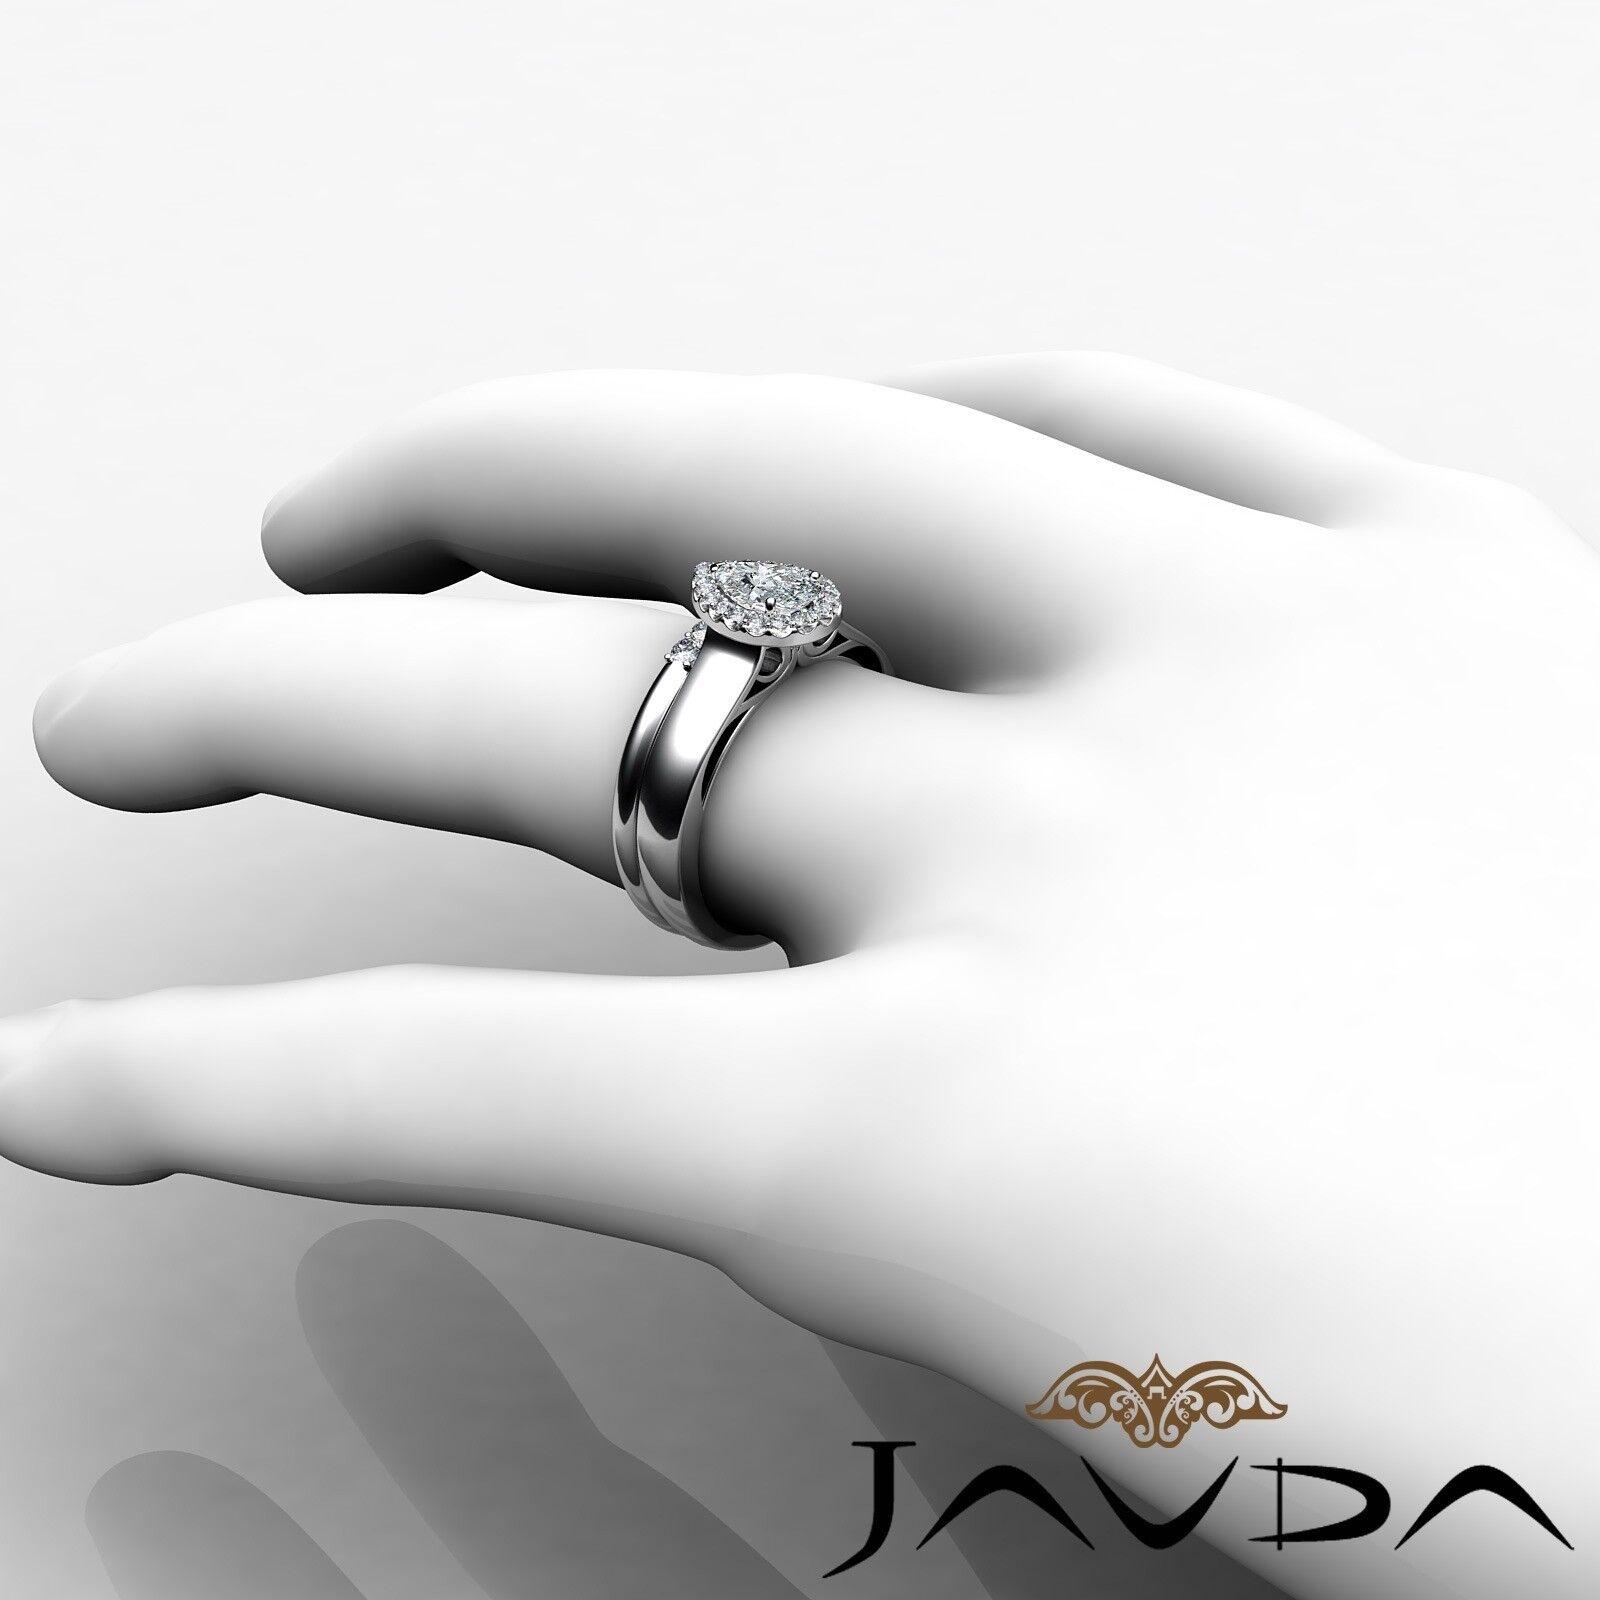 1.33ctw U Cut Pave Set Halo Bridal Pear Diamond Engagement Ring GIA F-VS2 W Gold 5